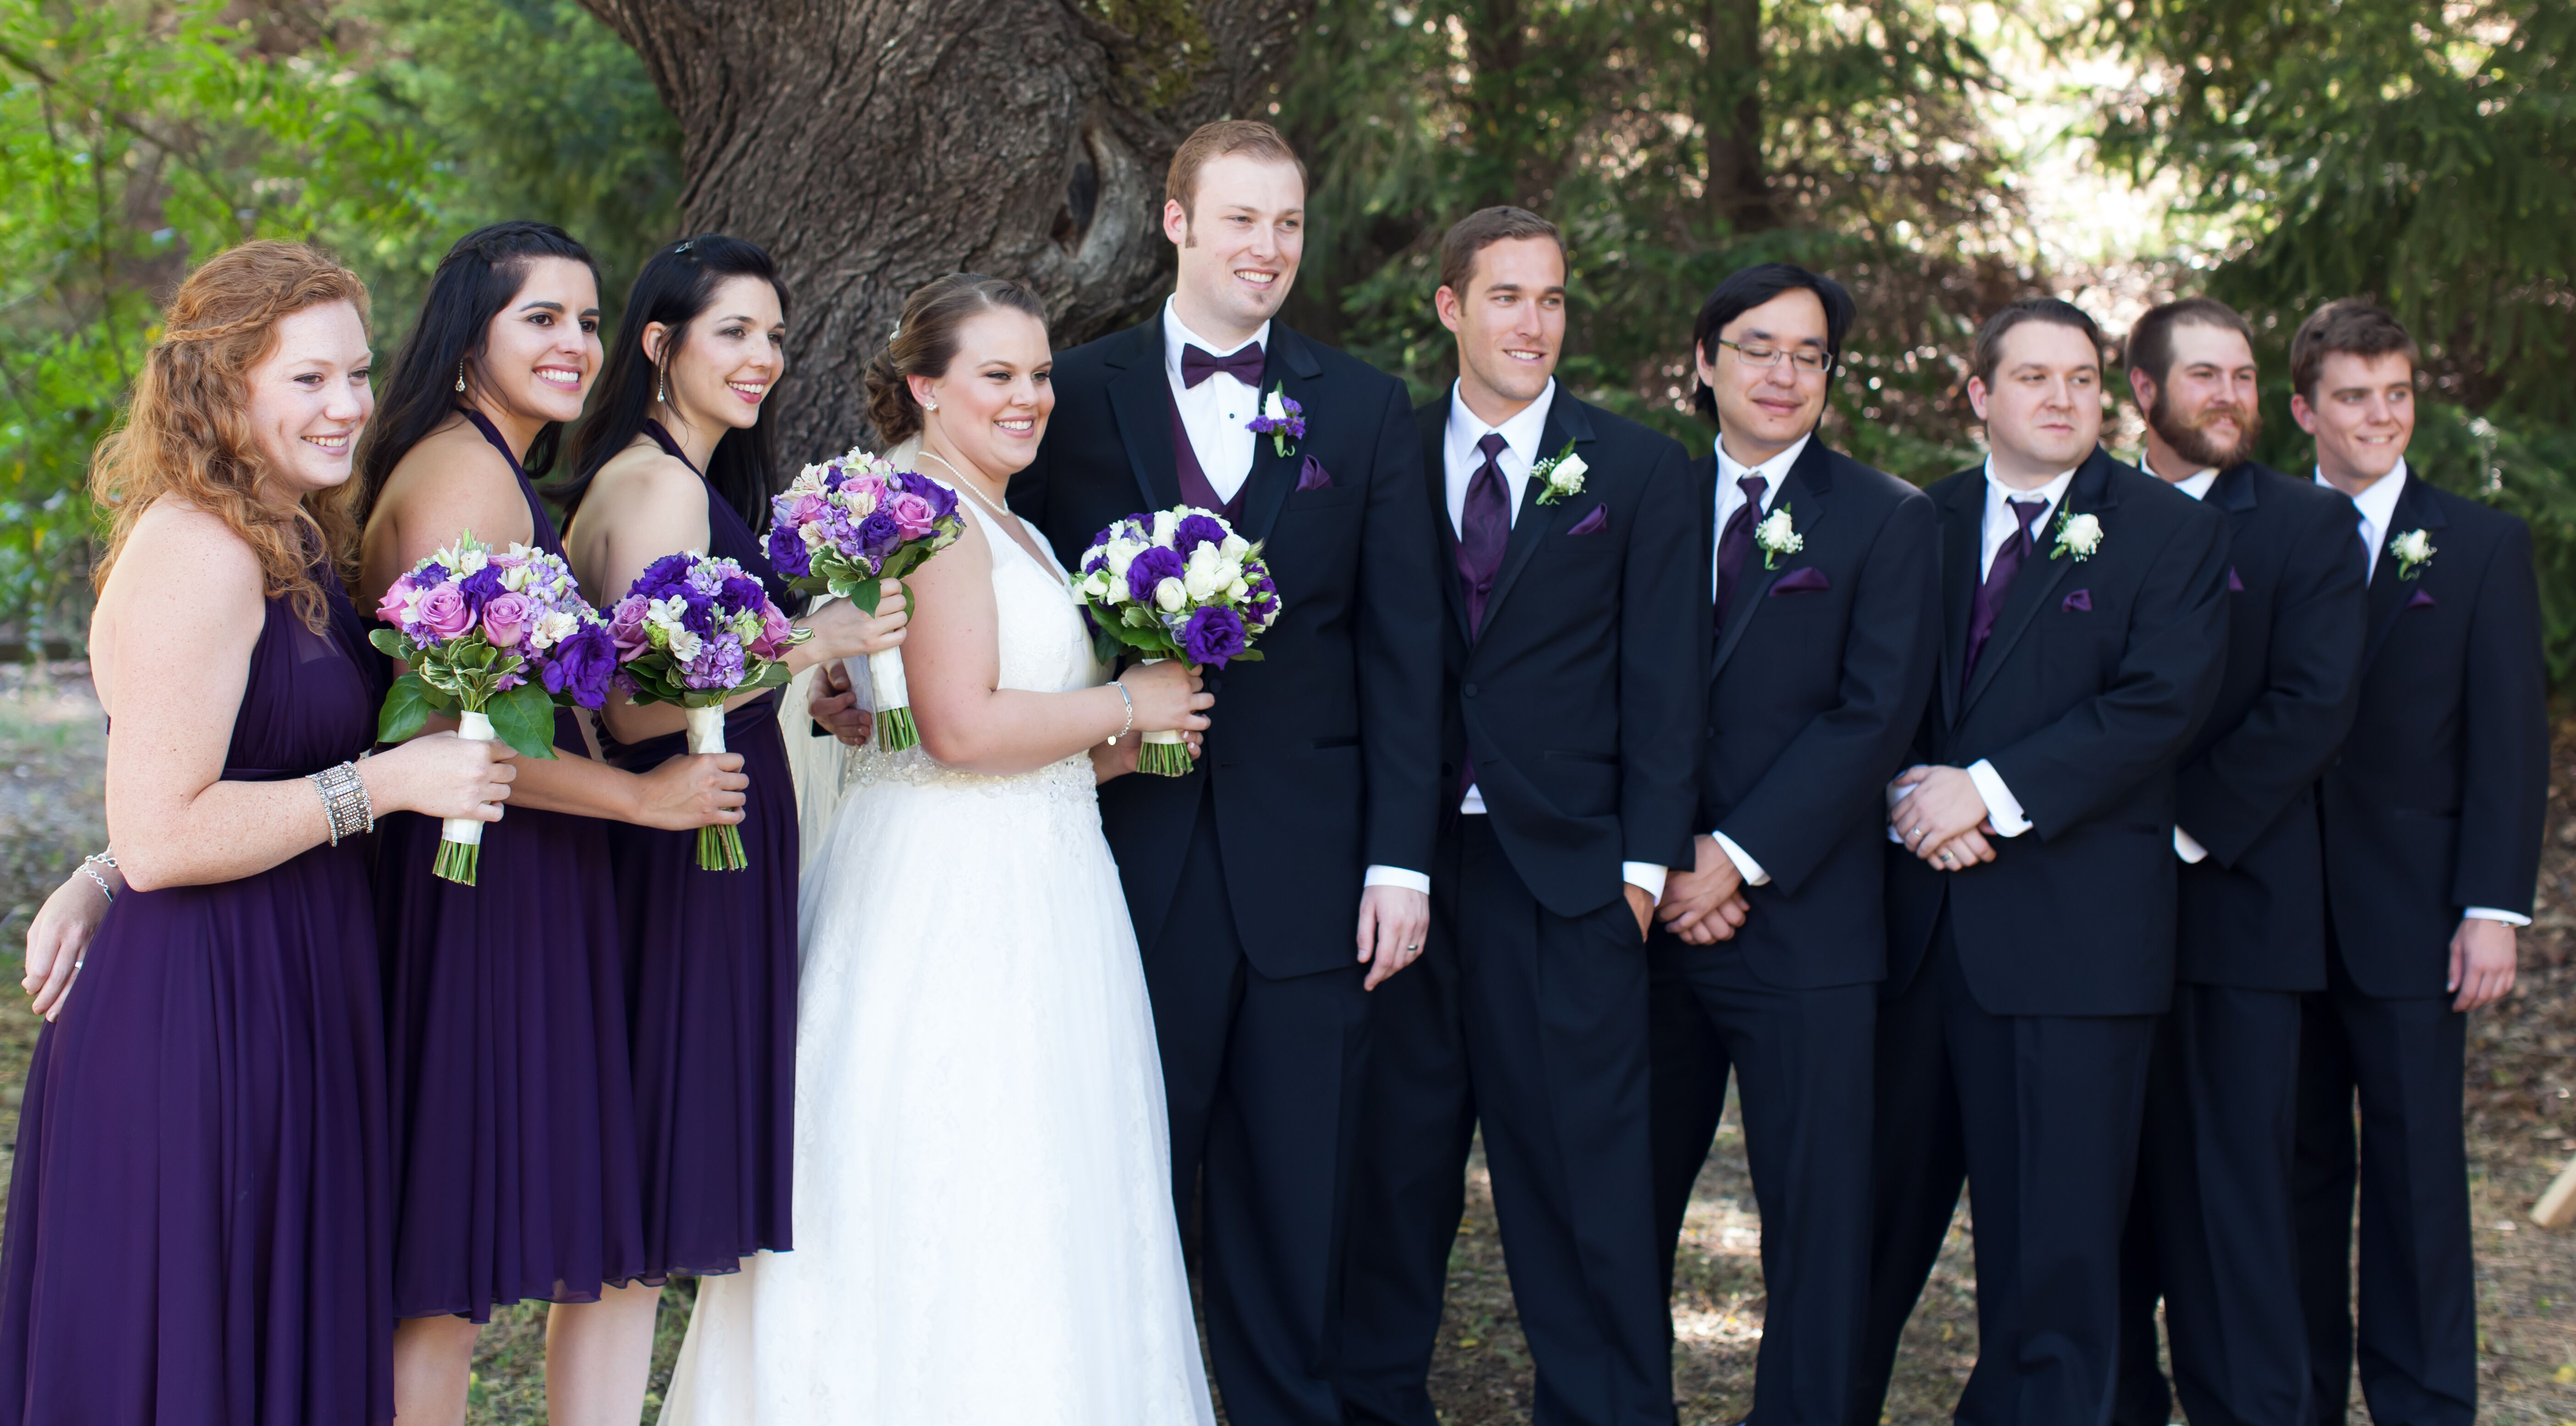 Black And Purple Wedding Party Attire,Plus Size Wedding Dress Short Length